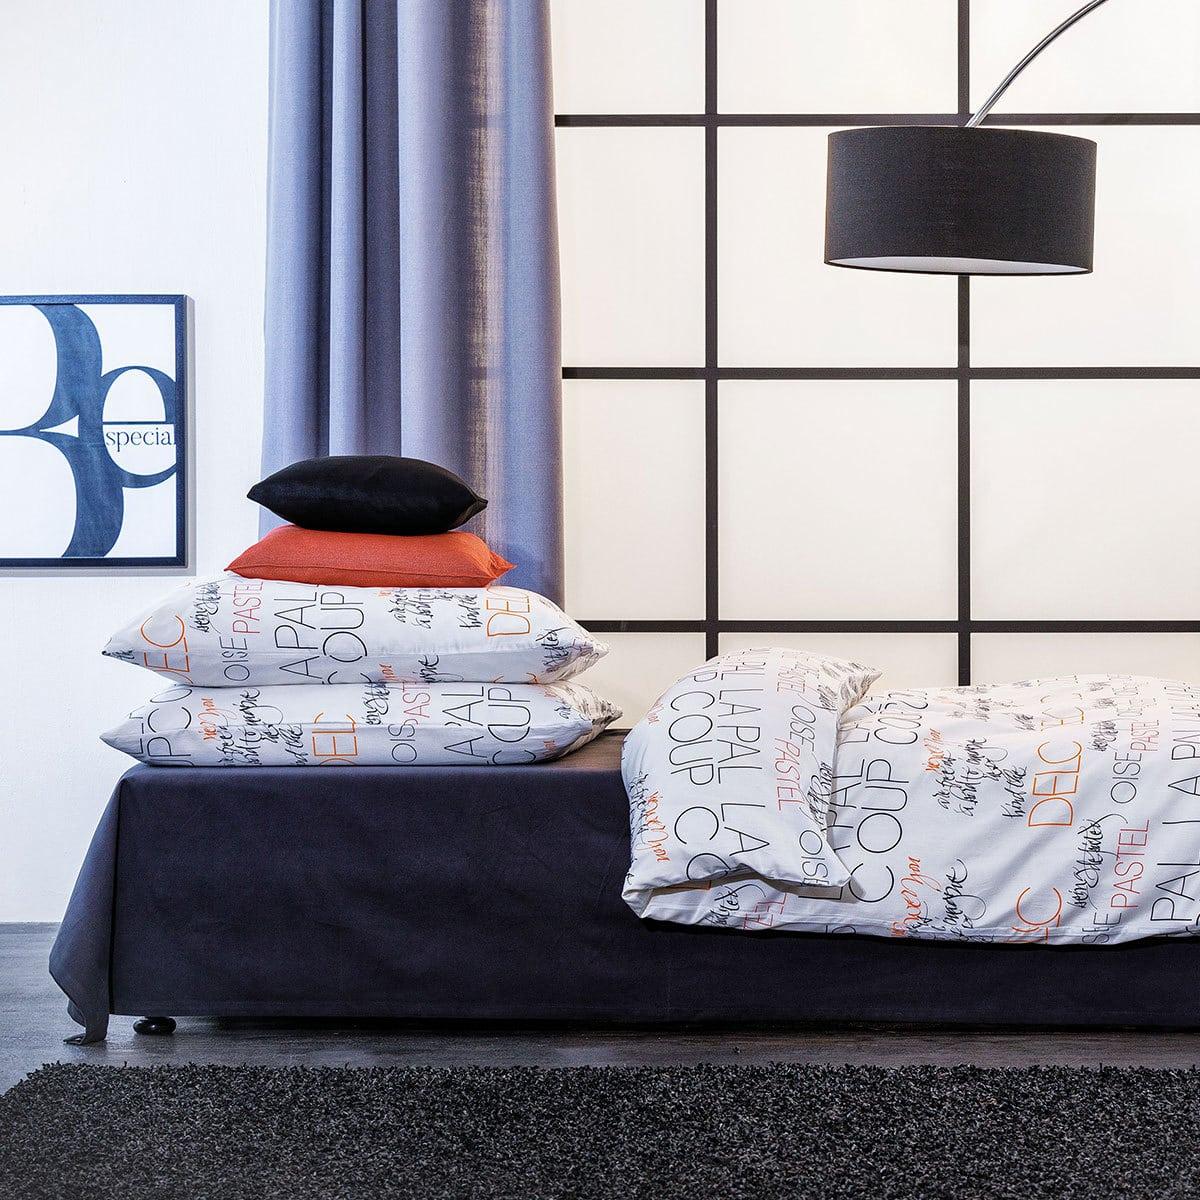 apelt mako satin bettw sche oskar weiss schwarz orange g nstig online kaufen bei bettwaren shop. Black Bedroom Furniture Sets. Home Design Ideas